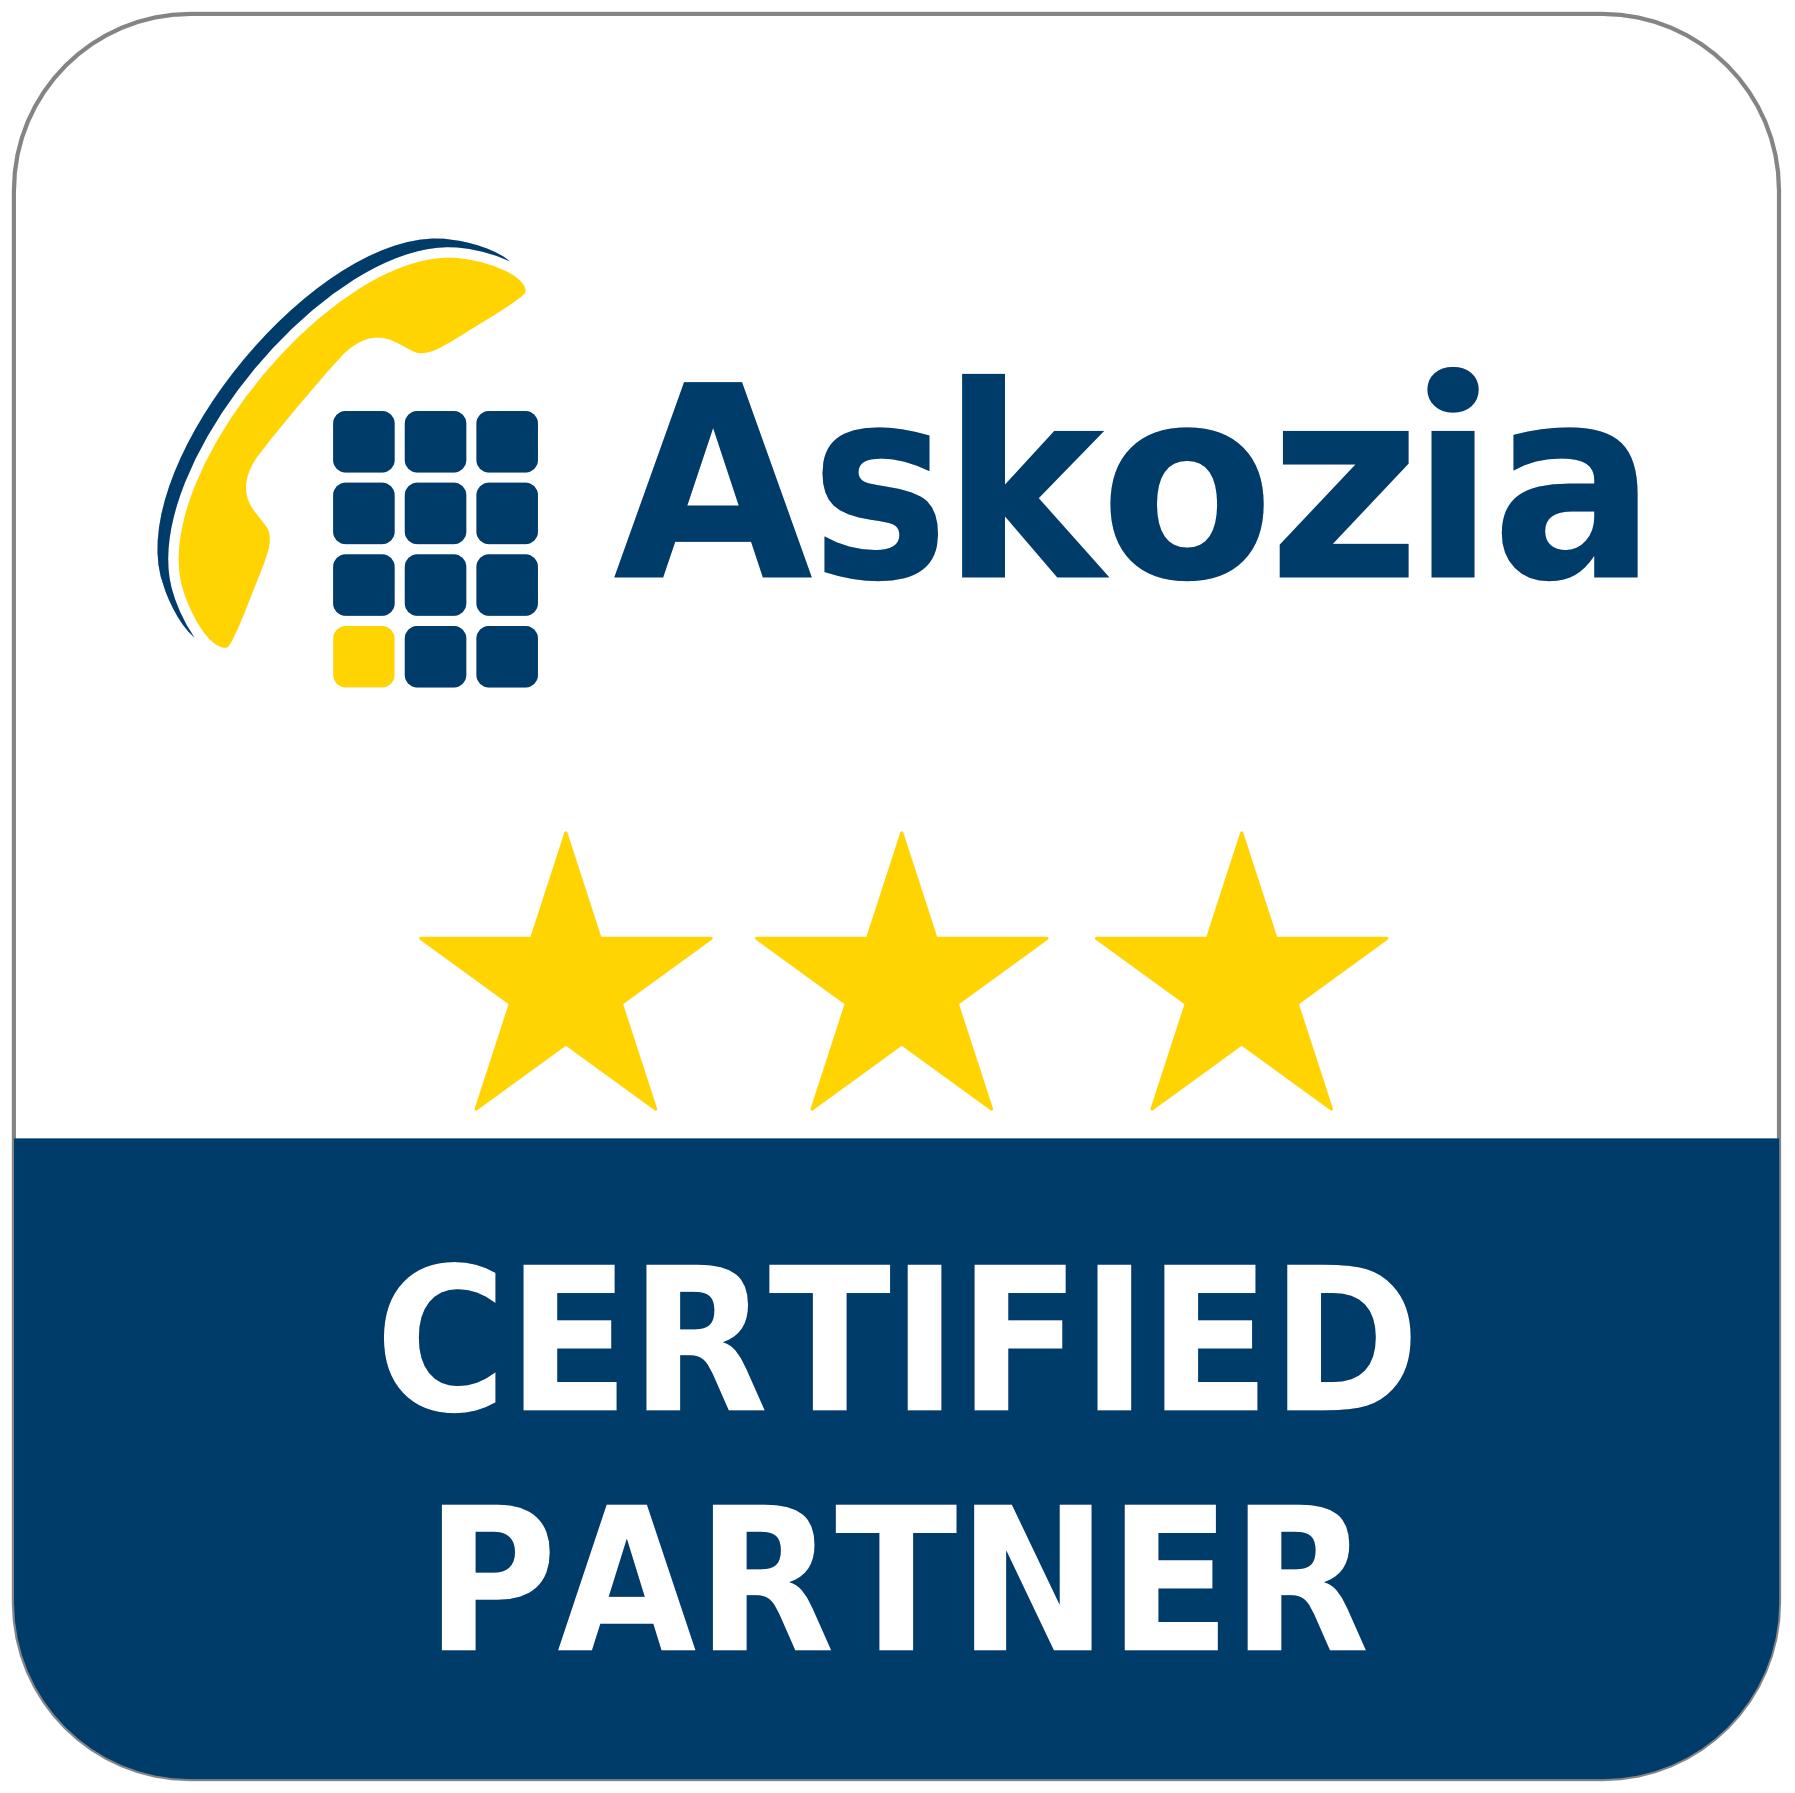 Logo Askozia inmedias.izt